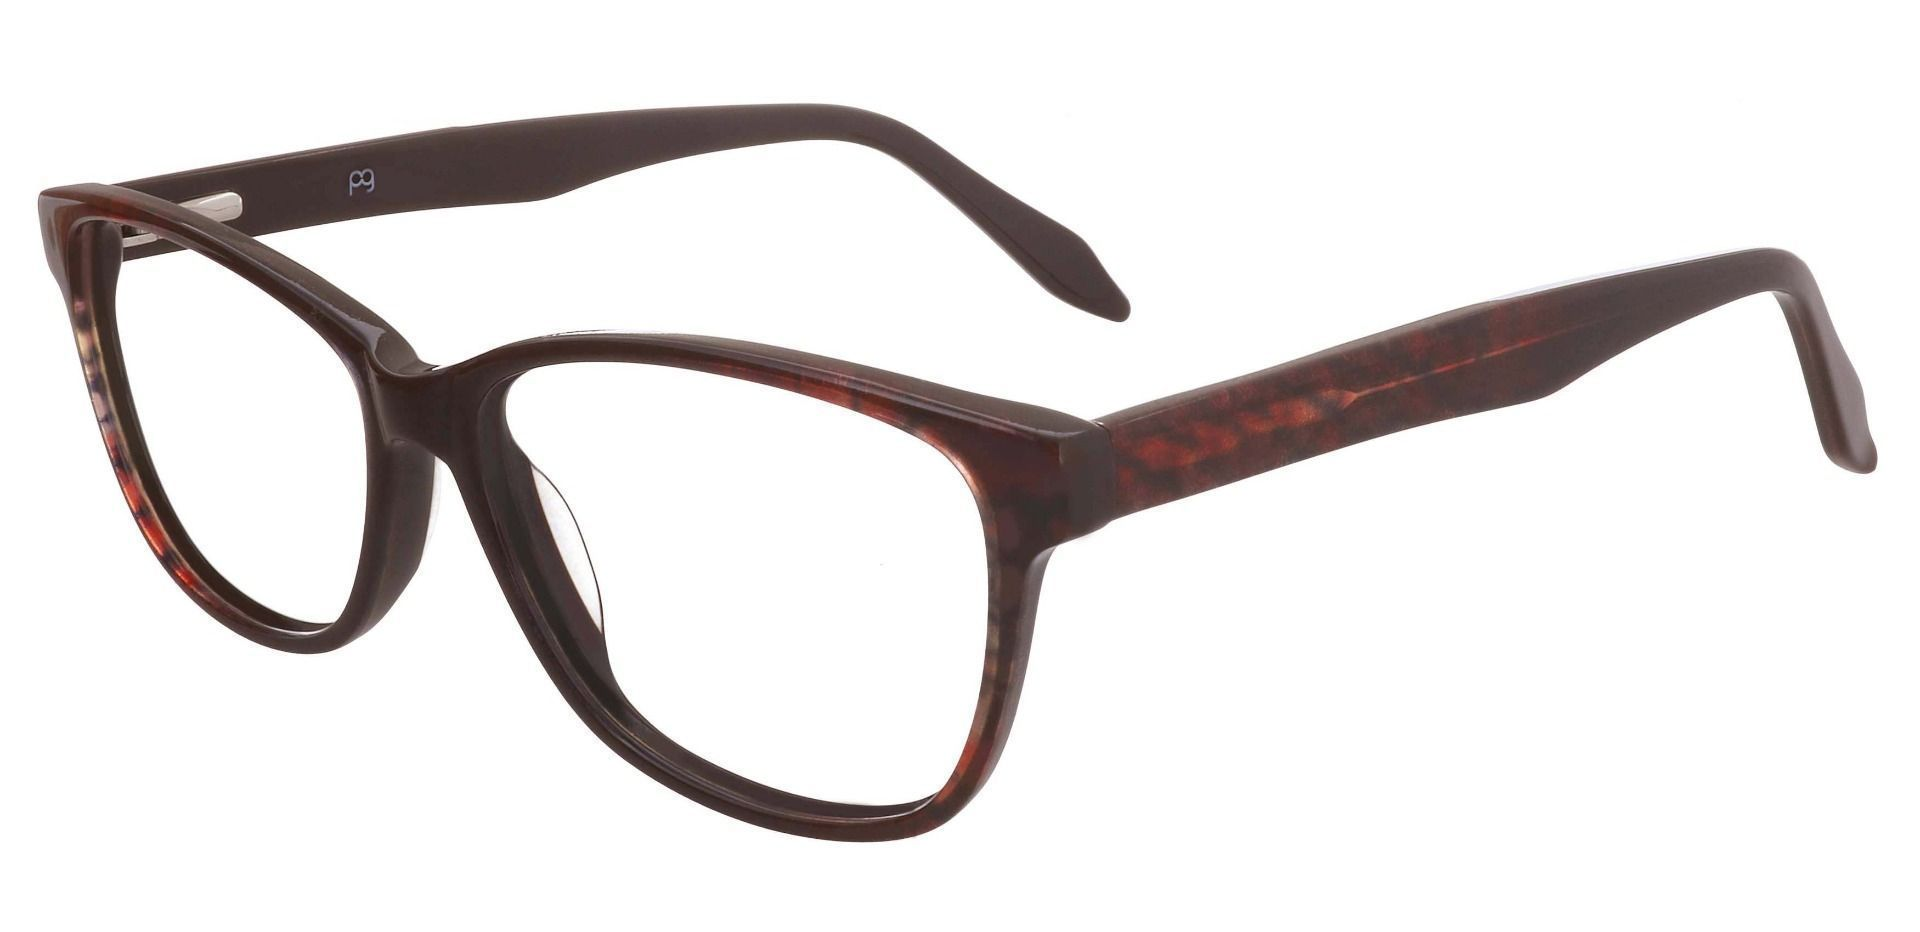 Bartlett Oval Prescription Glasses - Brown